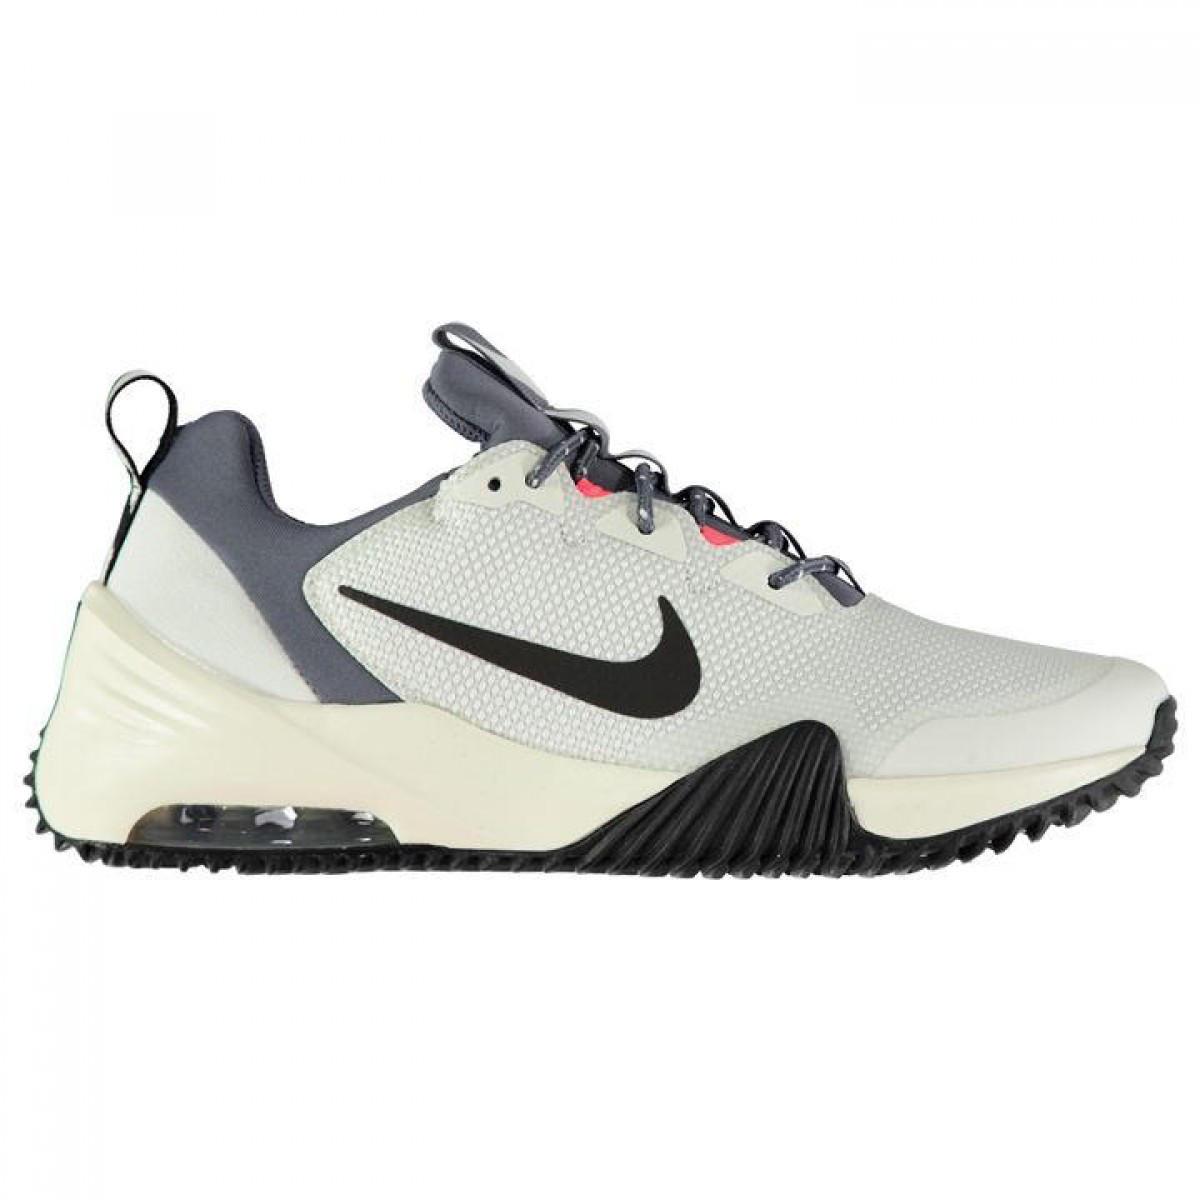 Кроссовки Nike Air Max Grigora White Black - Оригинал - купить по ... 0a4ad9c2c19